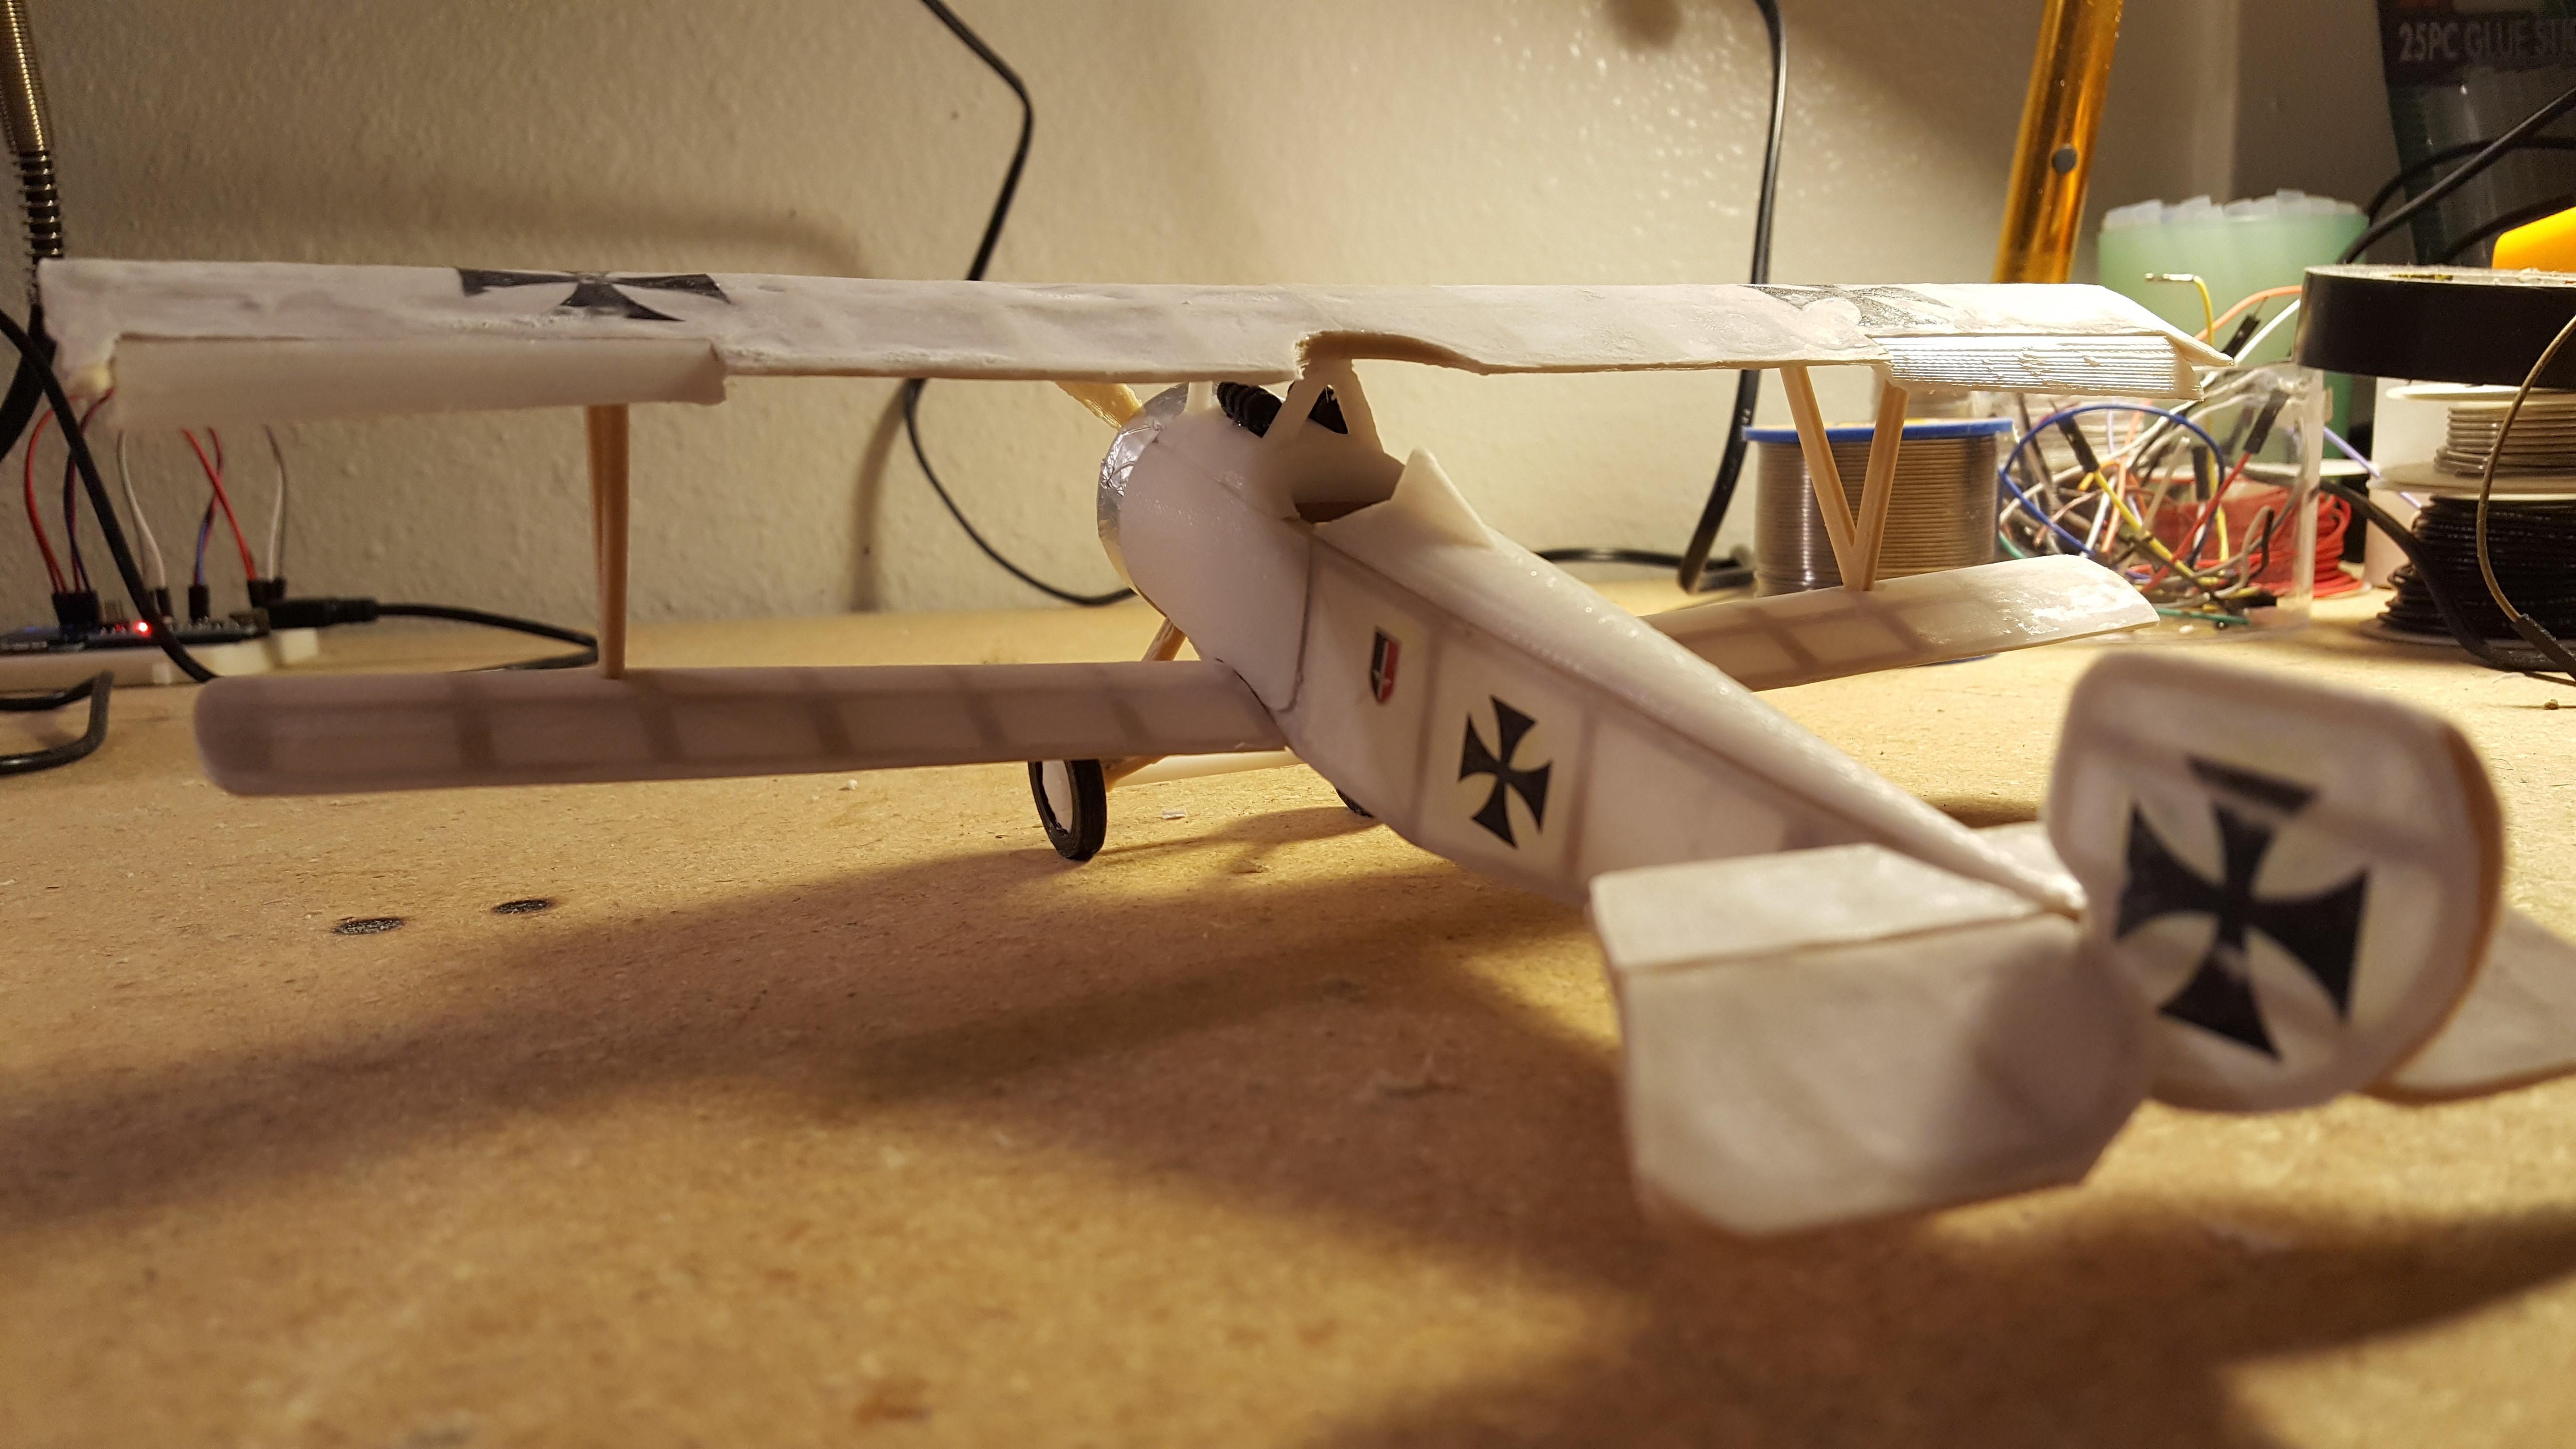 20171014_003643.jpg Download STL file Nieuport 17, WW1 Warplane • 3D printing design, JimmyHo